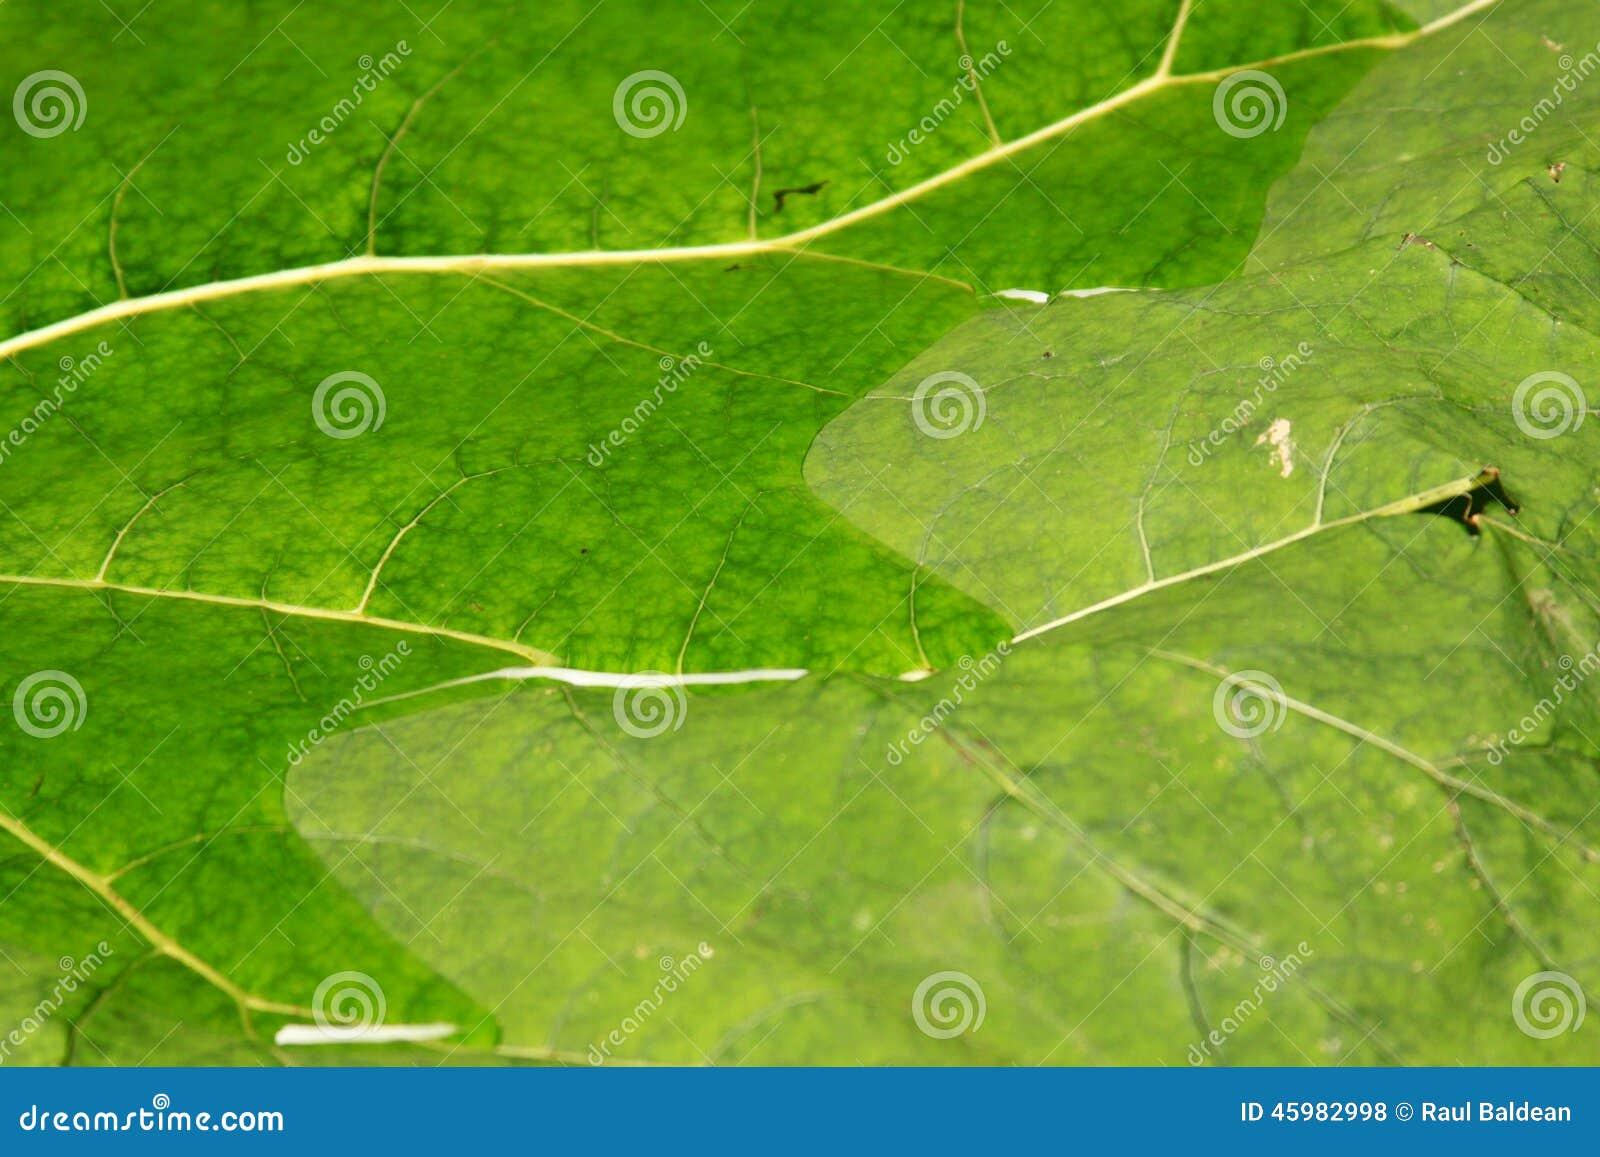 Green leaf texture background 02